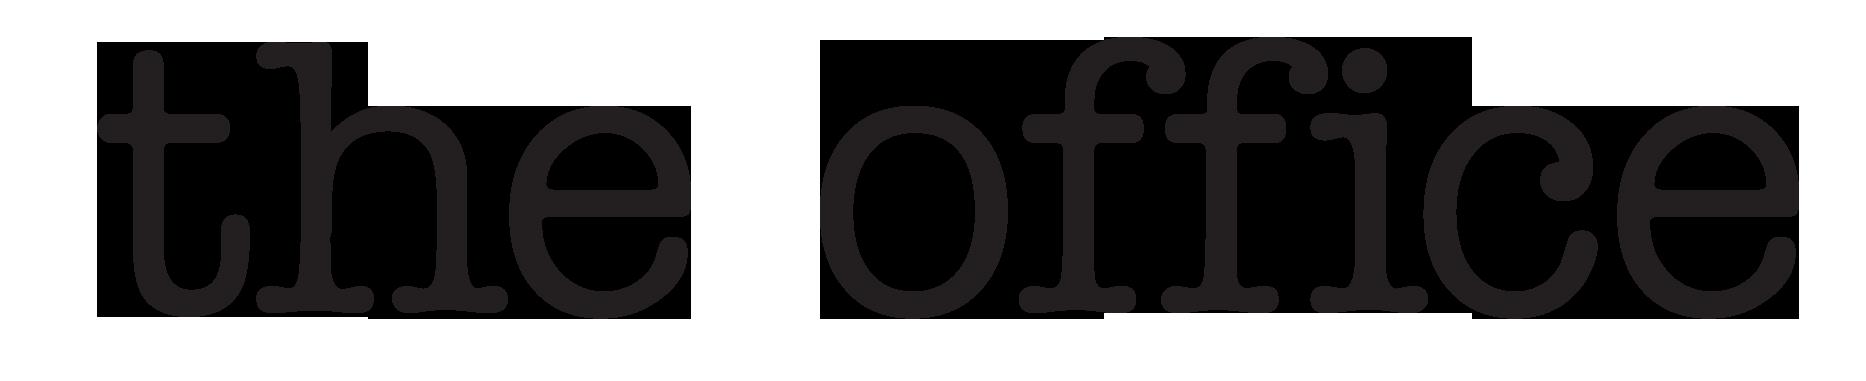 Image - The Office NBC logo.png   Logopedia   Fandom powered by Wikia